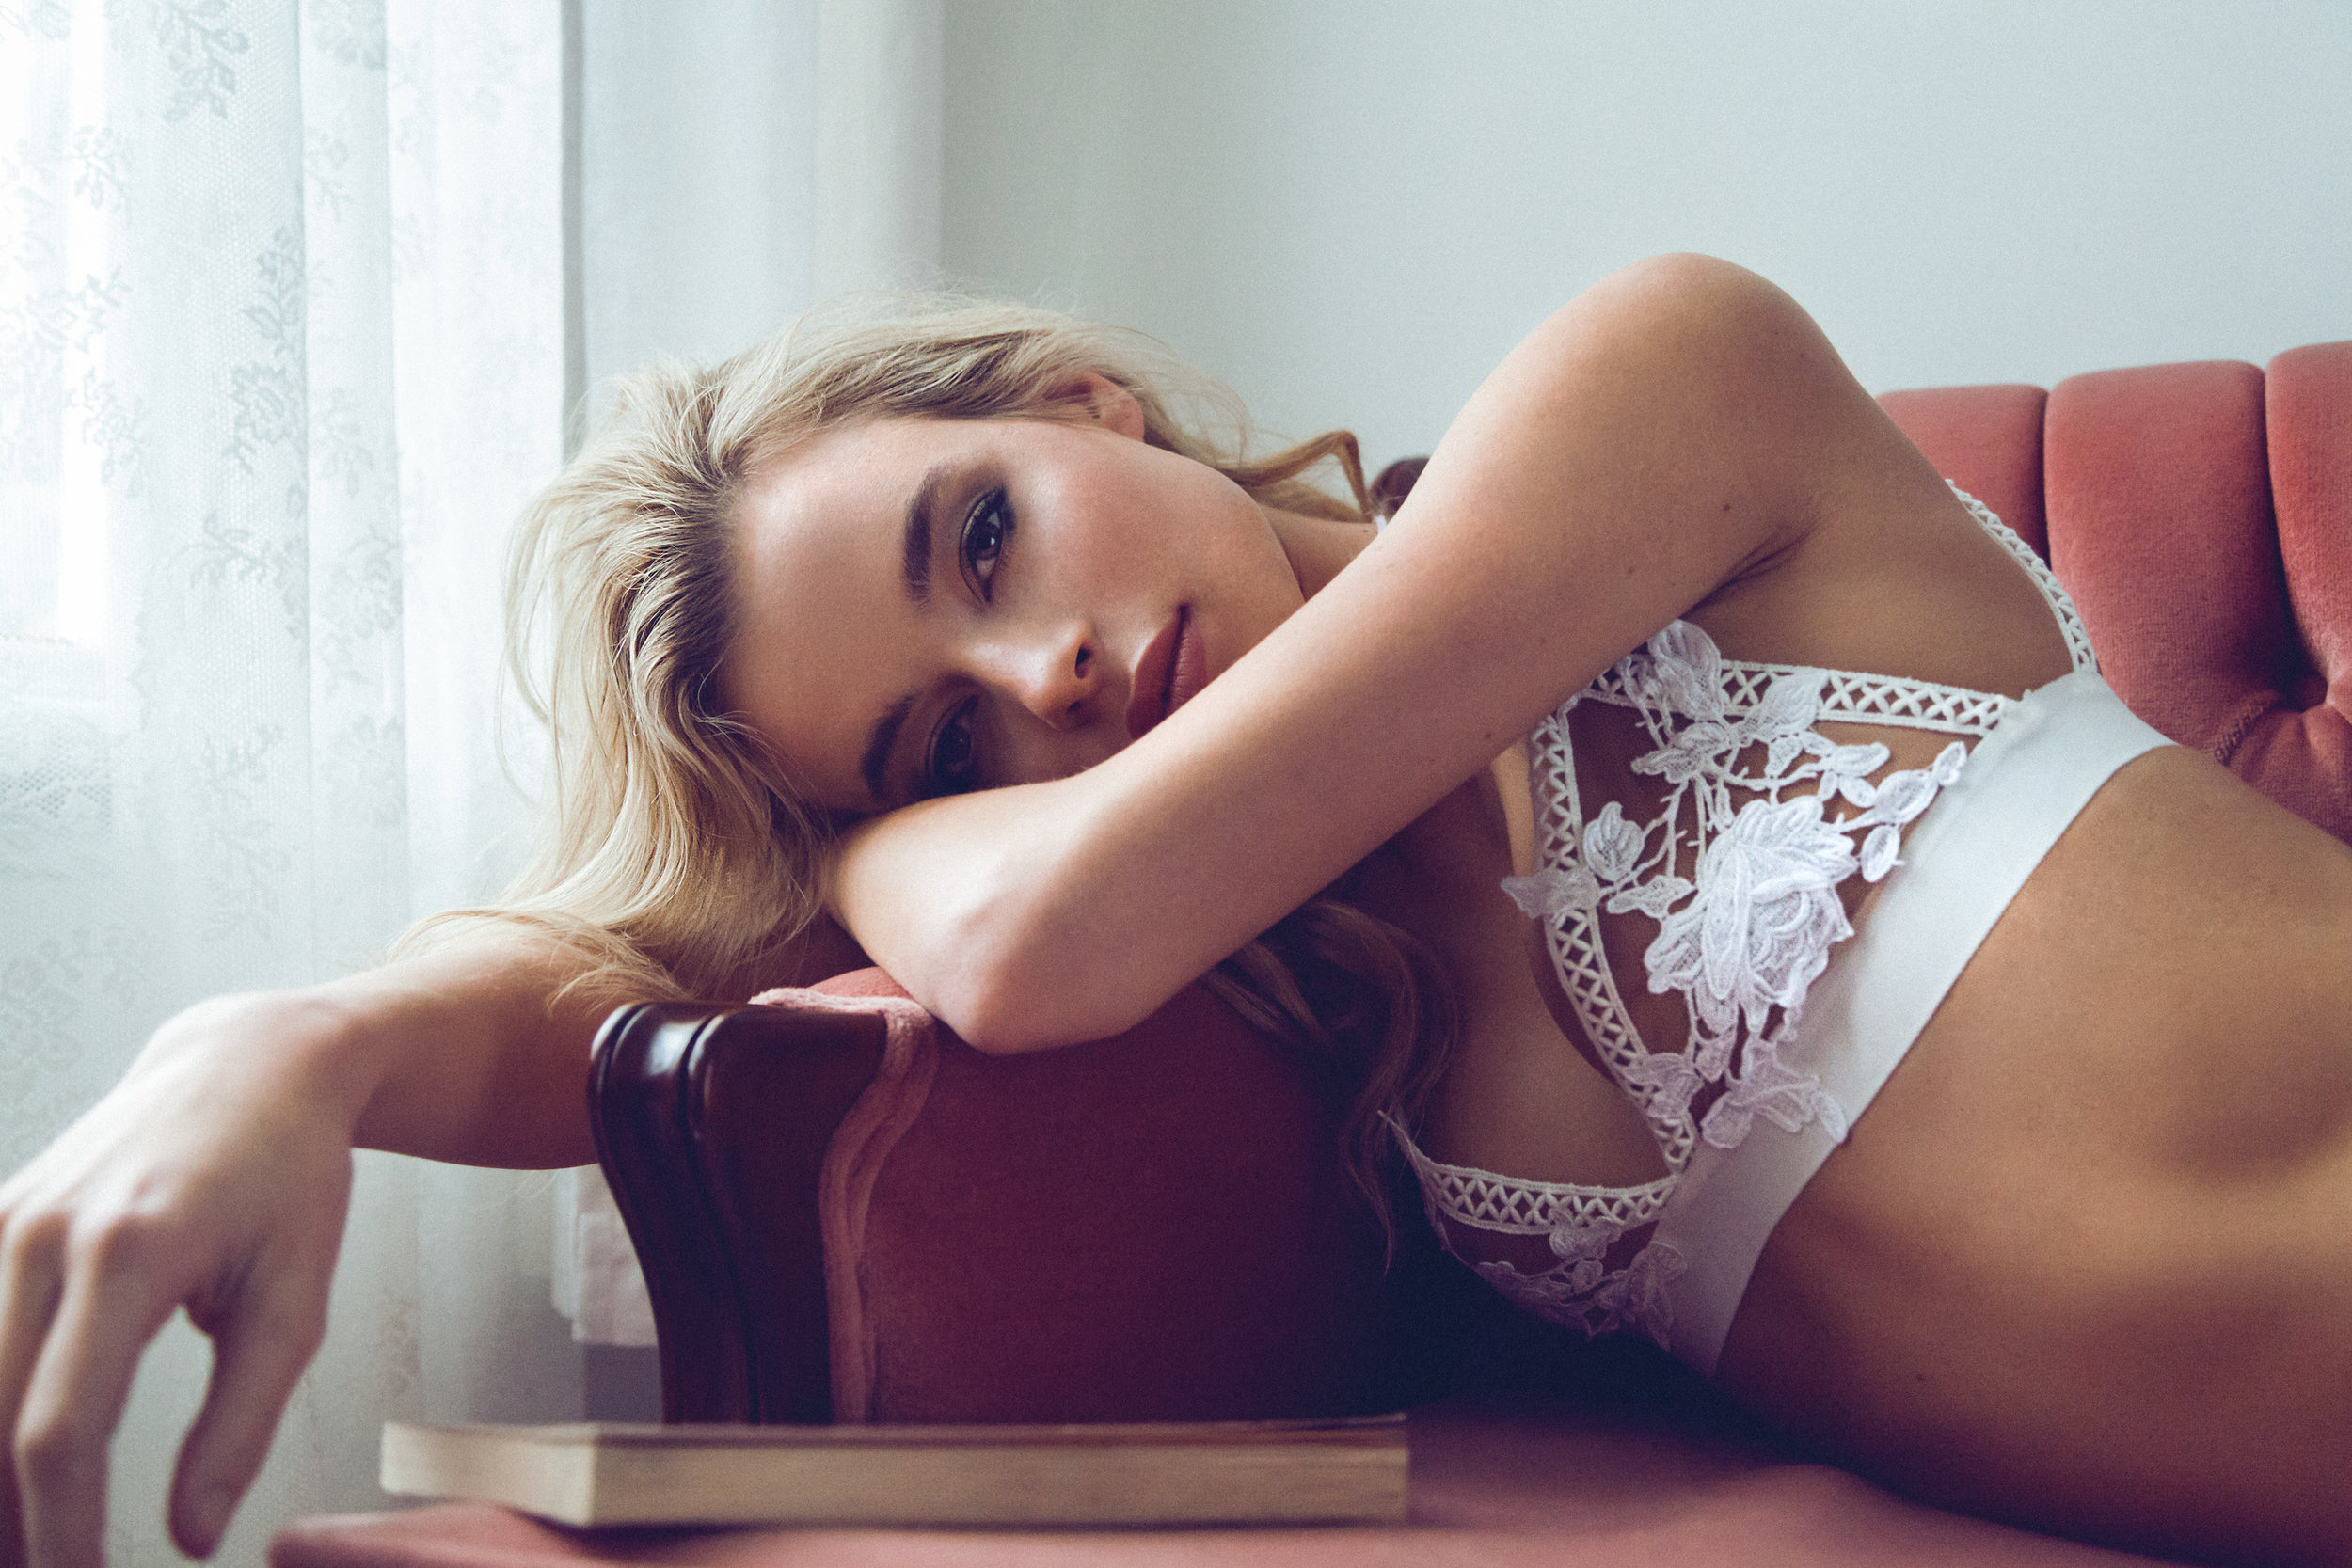 melizanne_lingerie6.jpg